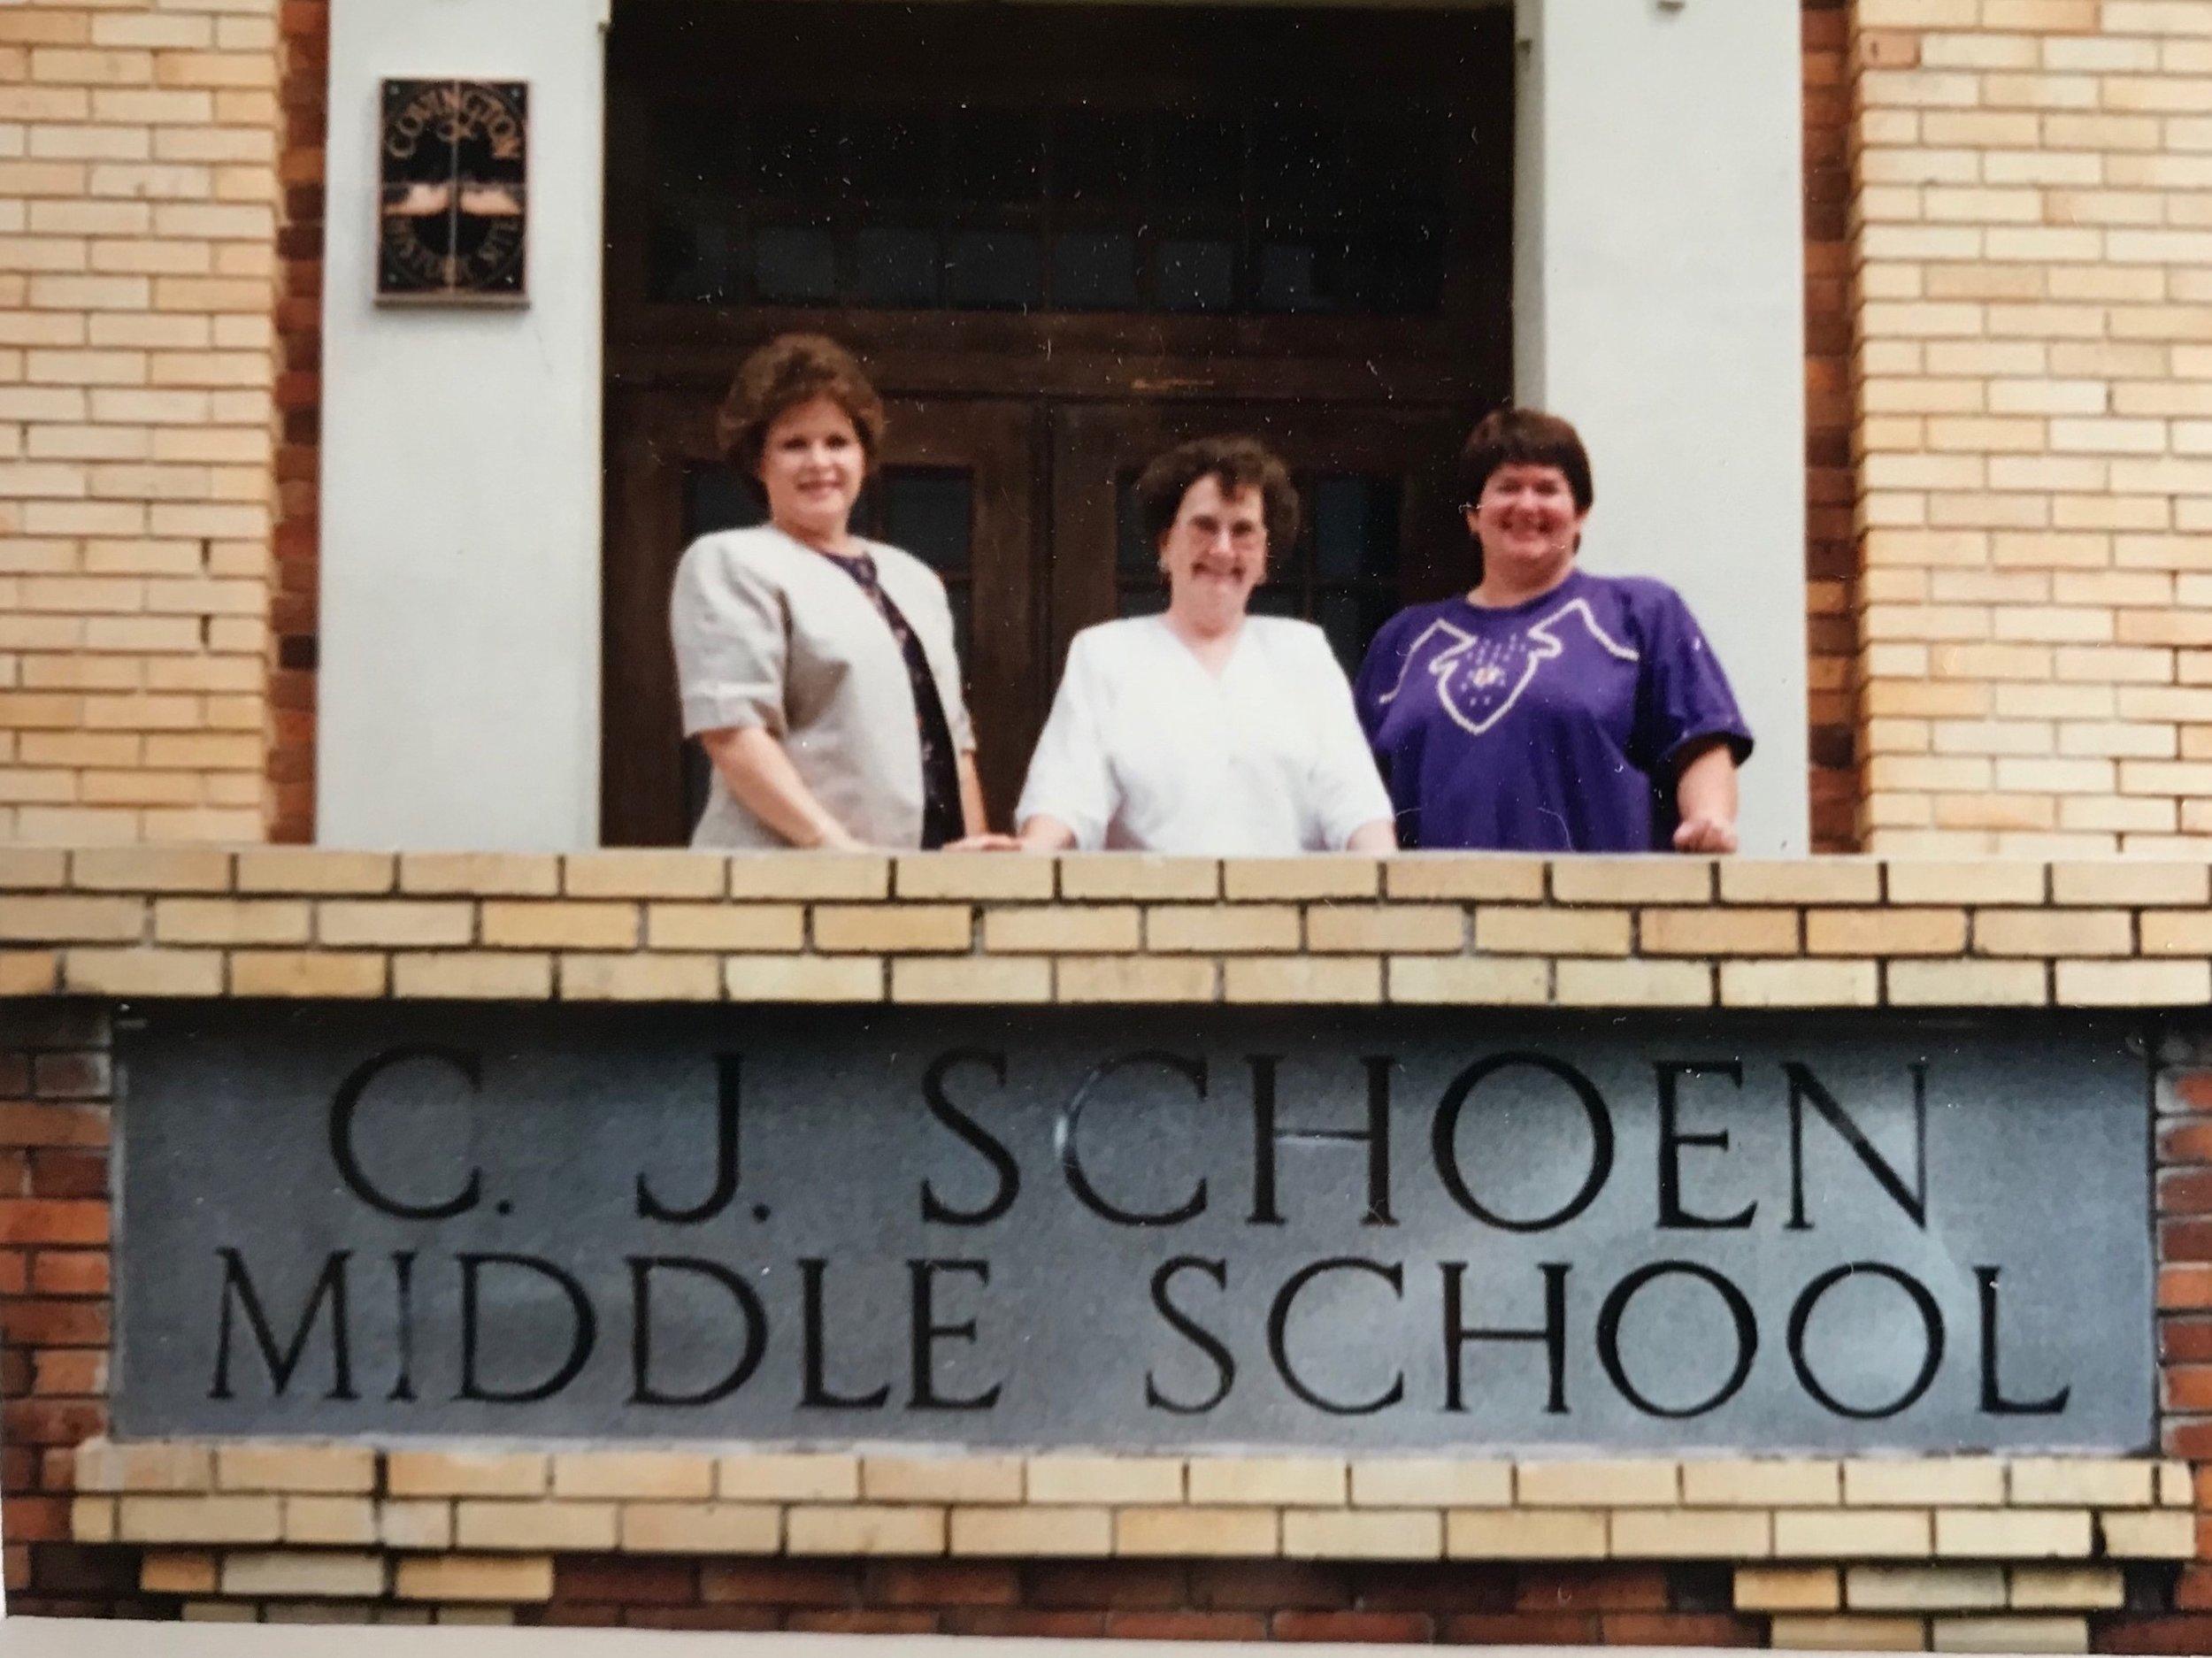 Mark-Johnson-Mother-Irene-Johnson-St-Tammany-Parish-School-System-CJ-Schoen-Middle-School.jpg